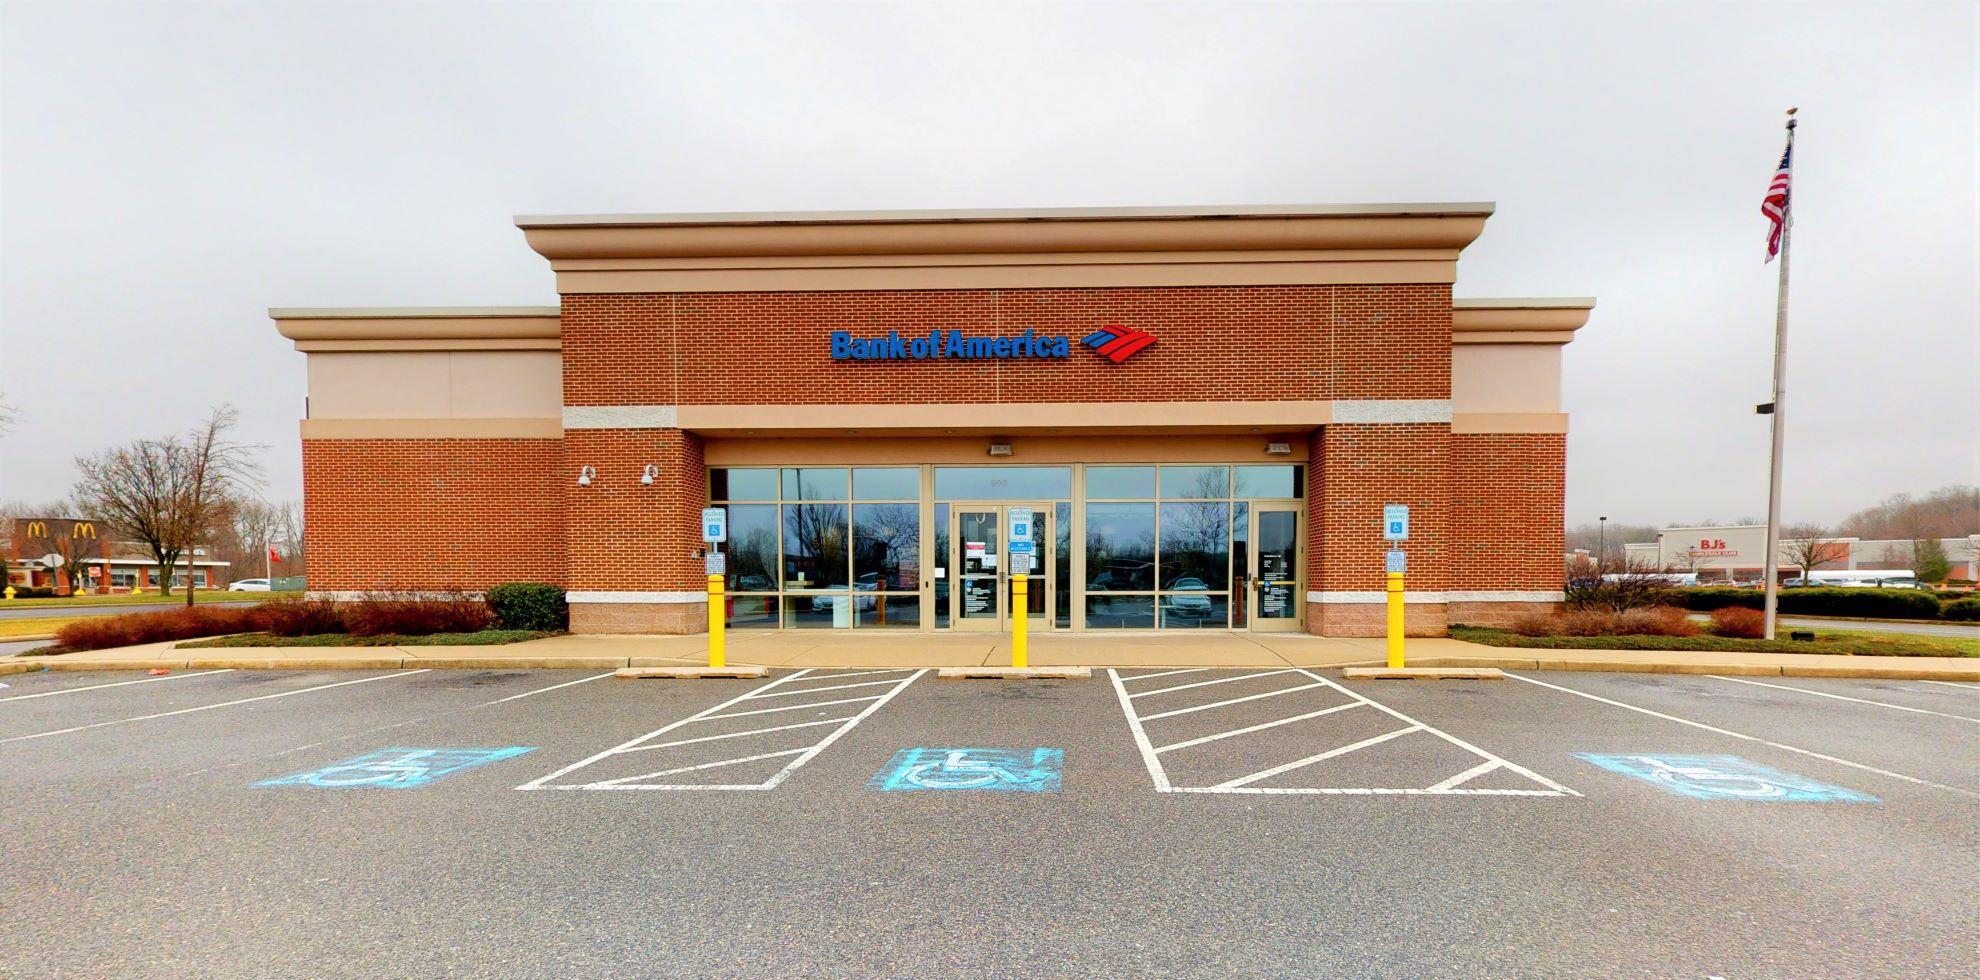 Bank of America financial center with drive-thru ATM | 800 Marketplace Blvd, Hamilton, NJ 08691